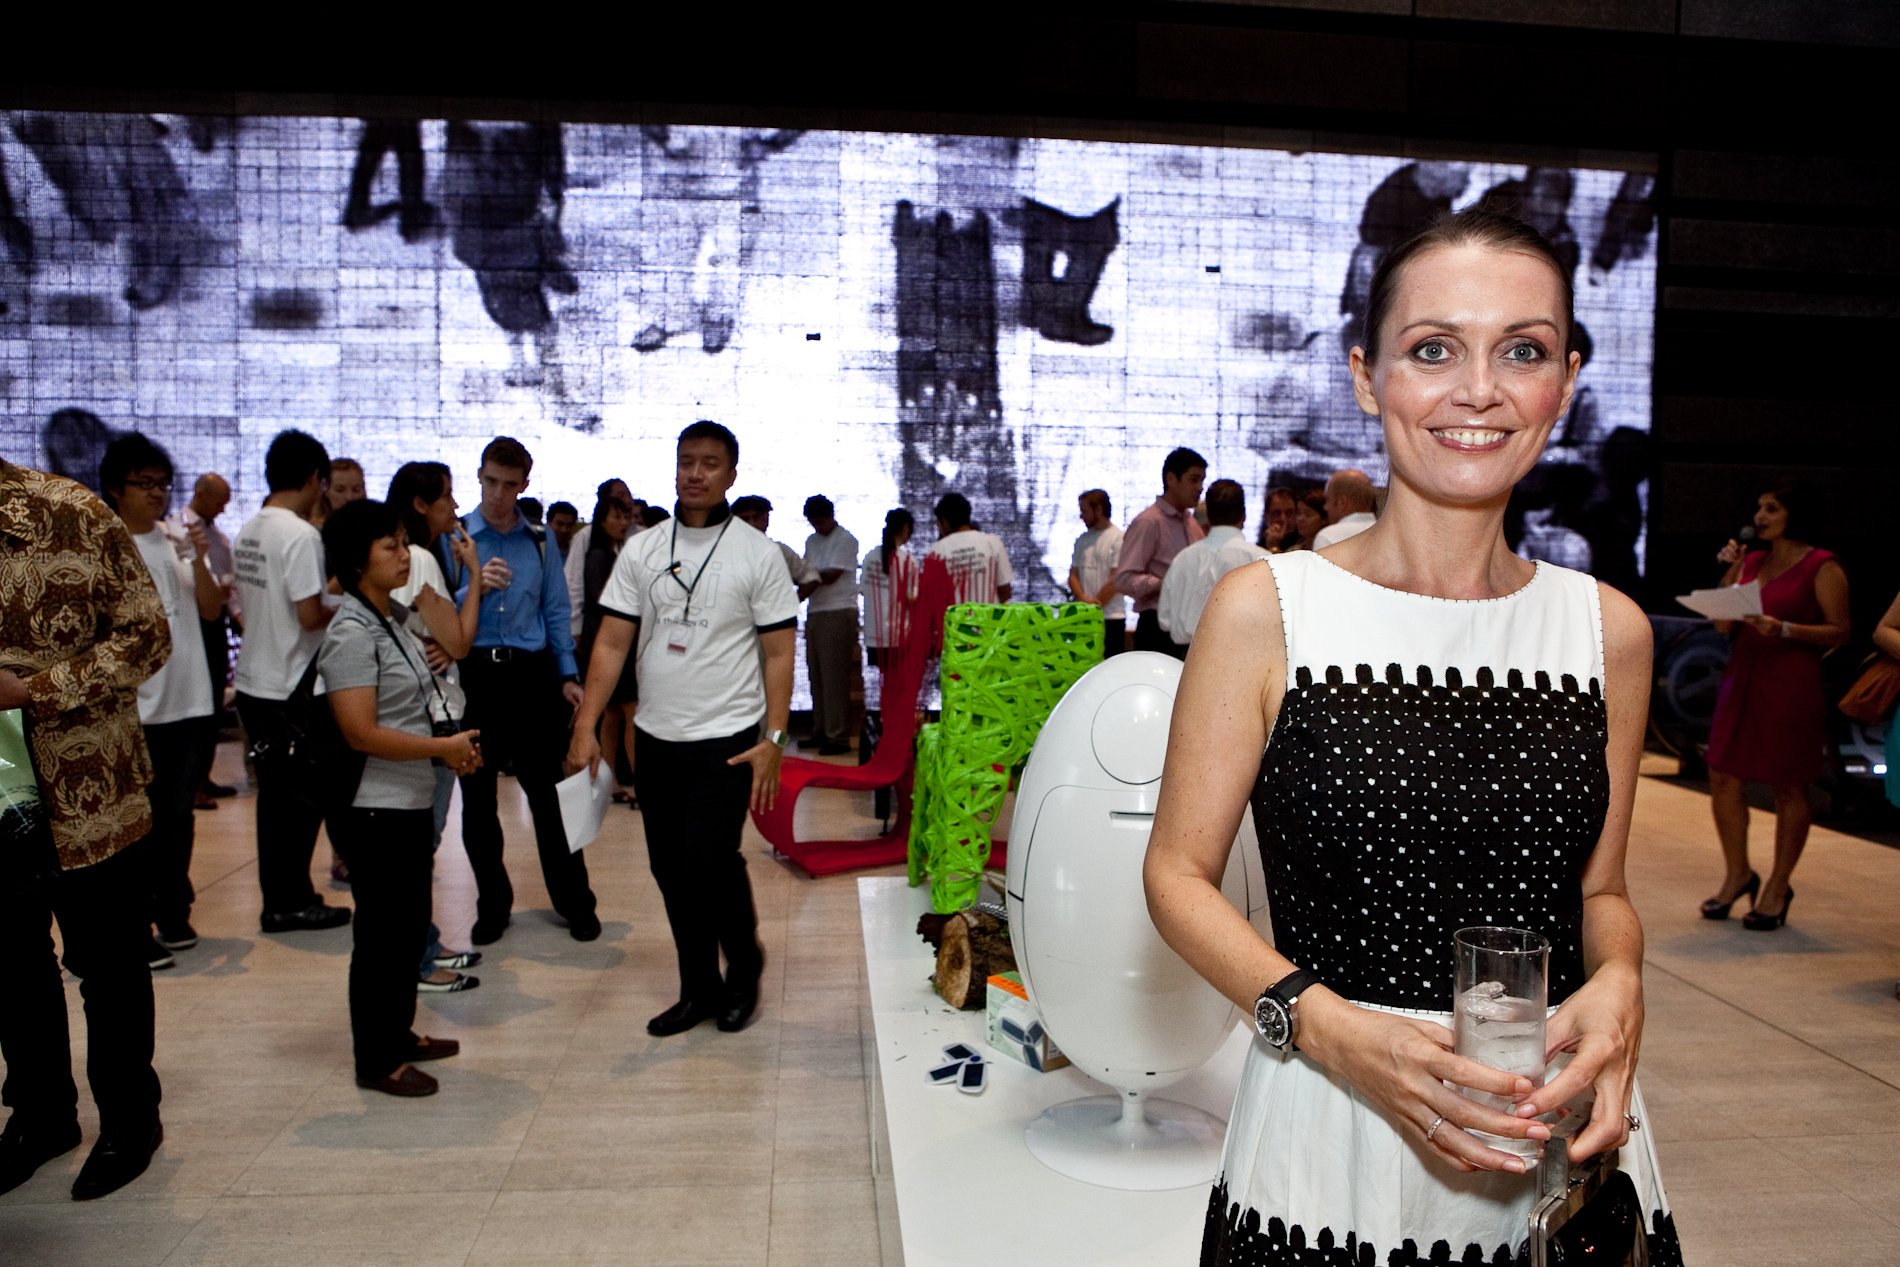 qi-global-2009-sustaible-design-singapore-072.jpg